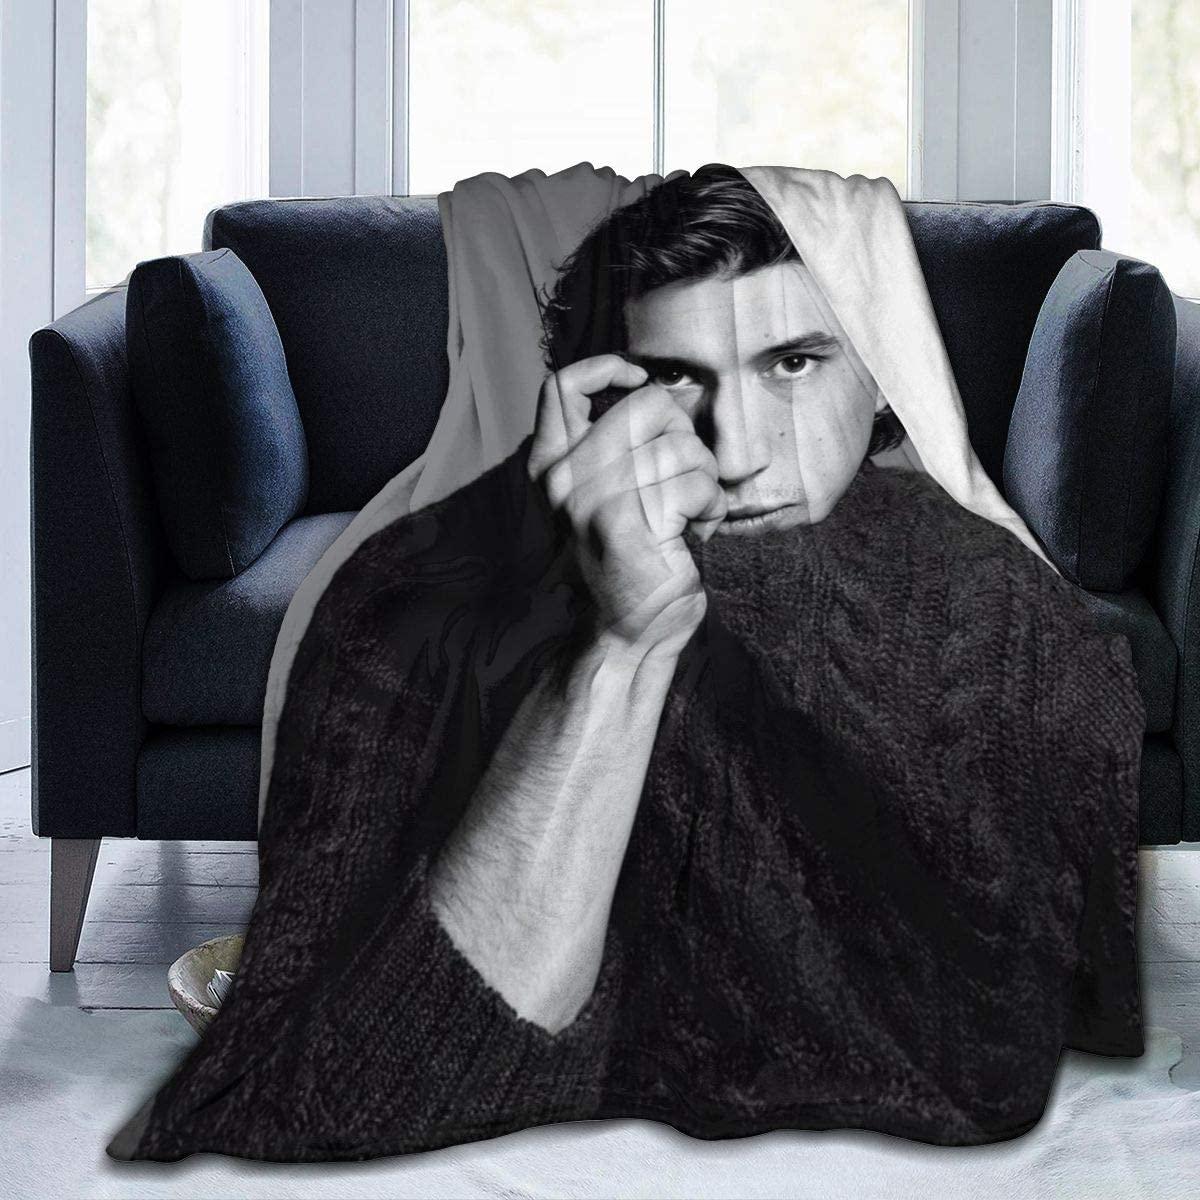 JUNIP Ultra-Soft Micro Fleece Adam Douglas Driver Blanket Lightweight Cozy Flannel Throw Blanket for Children/Adults